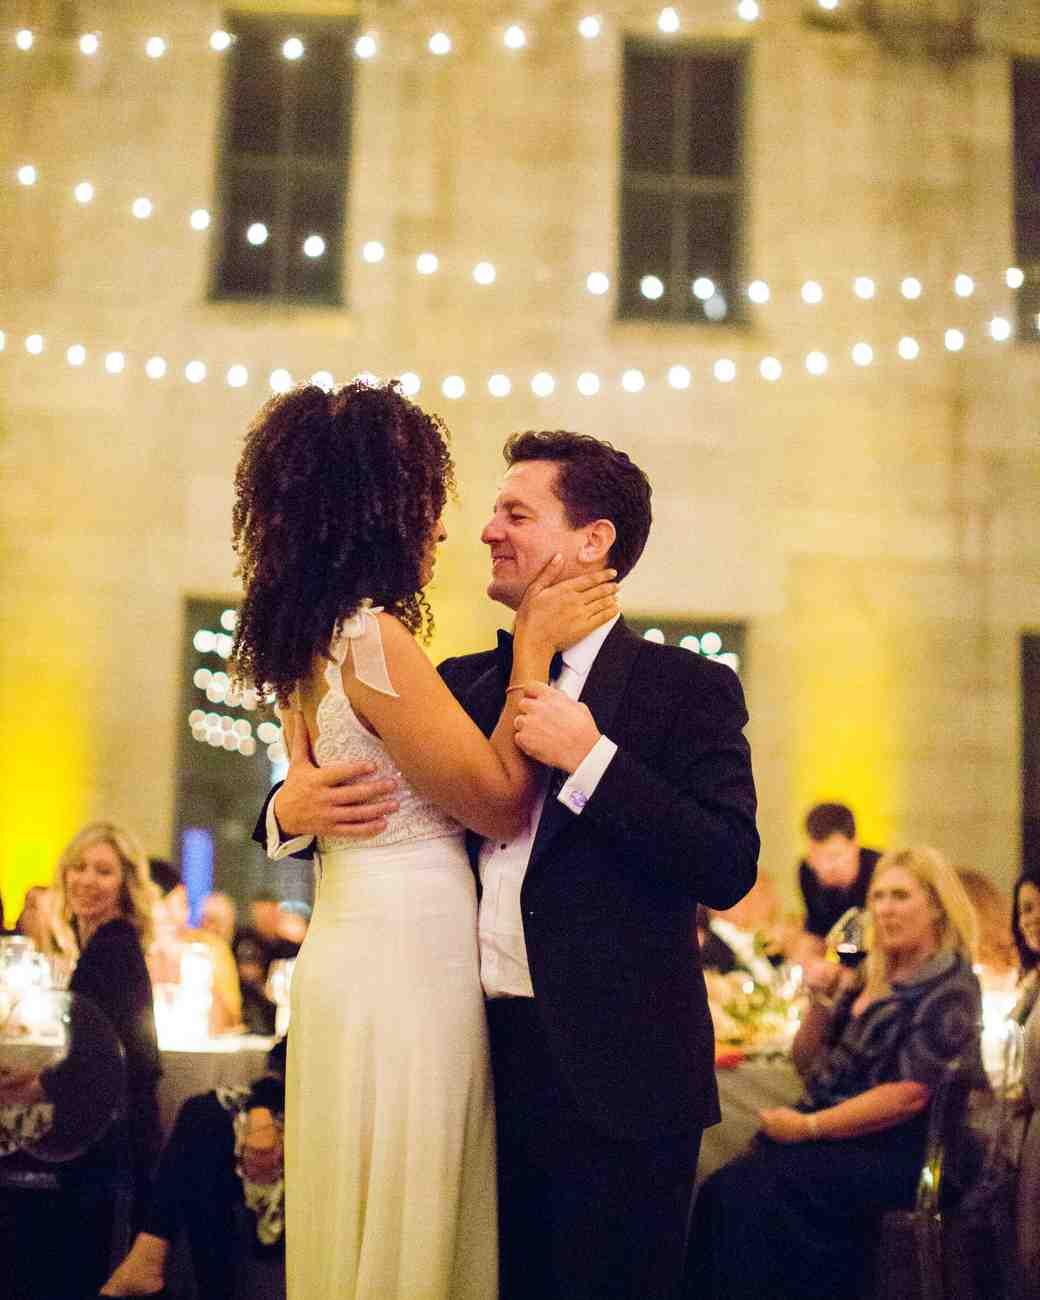 natalie louis wedding first dance